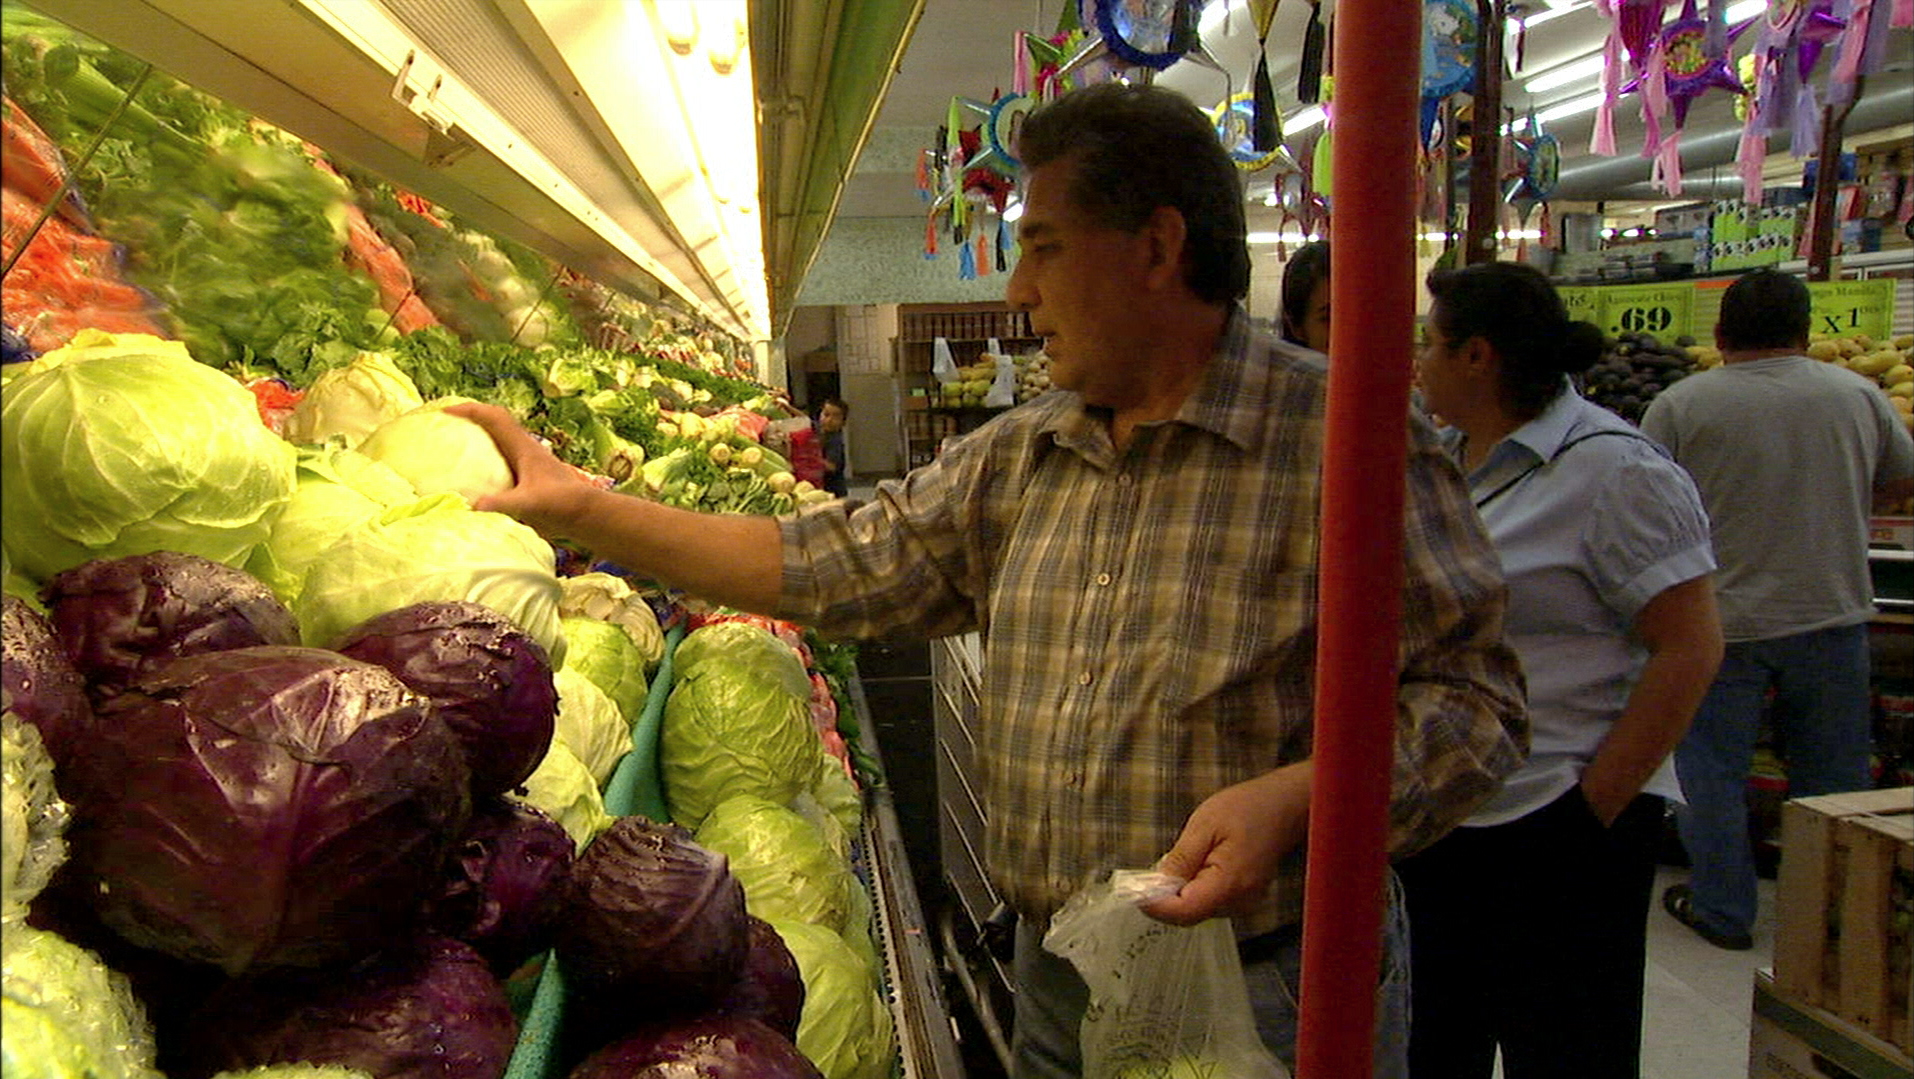 FOOD INC_Orozcos at market.jpg